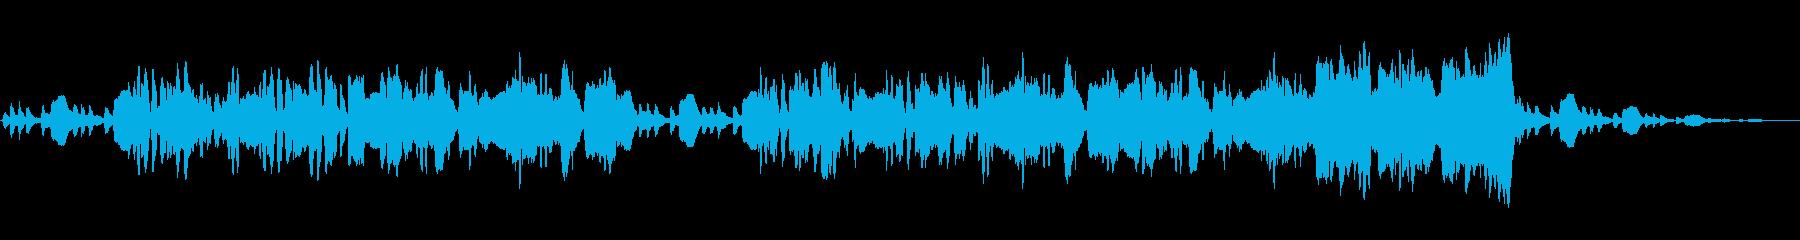 【RPG】不思議な森をイメージした管弦楽の再生済みの波形